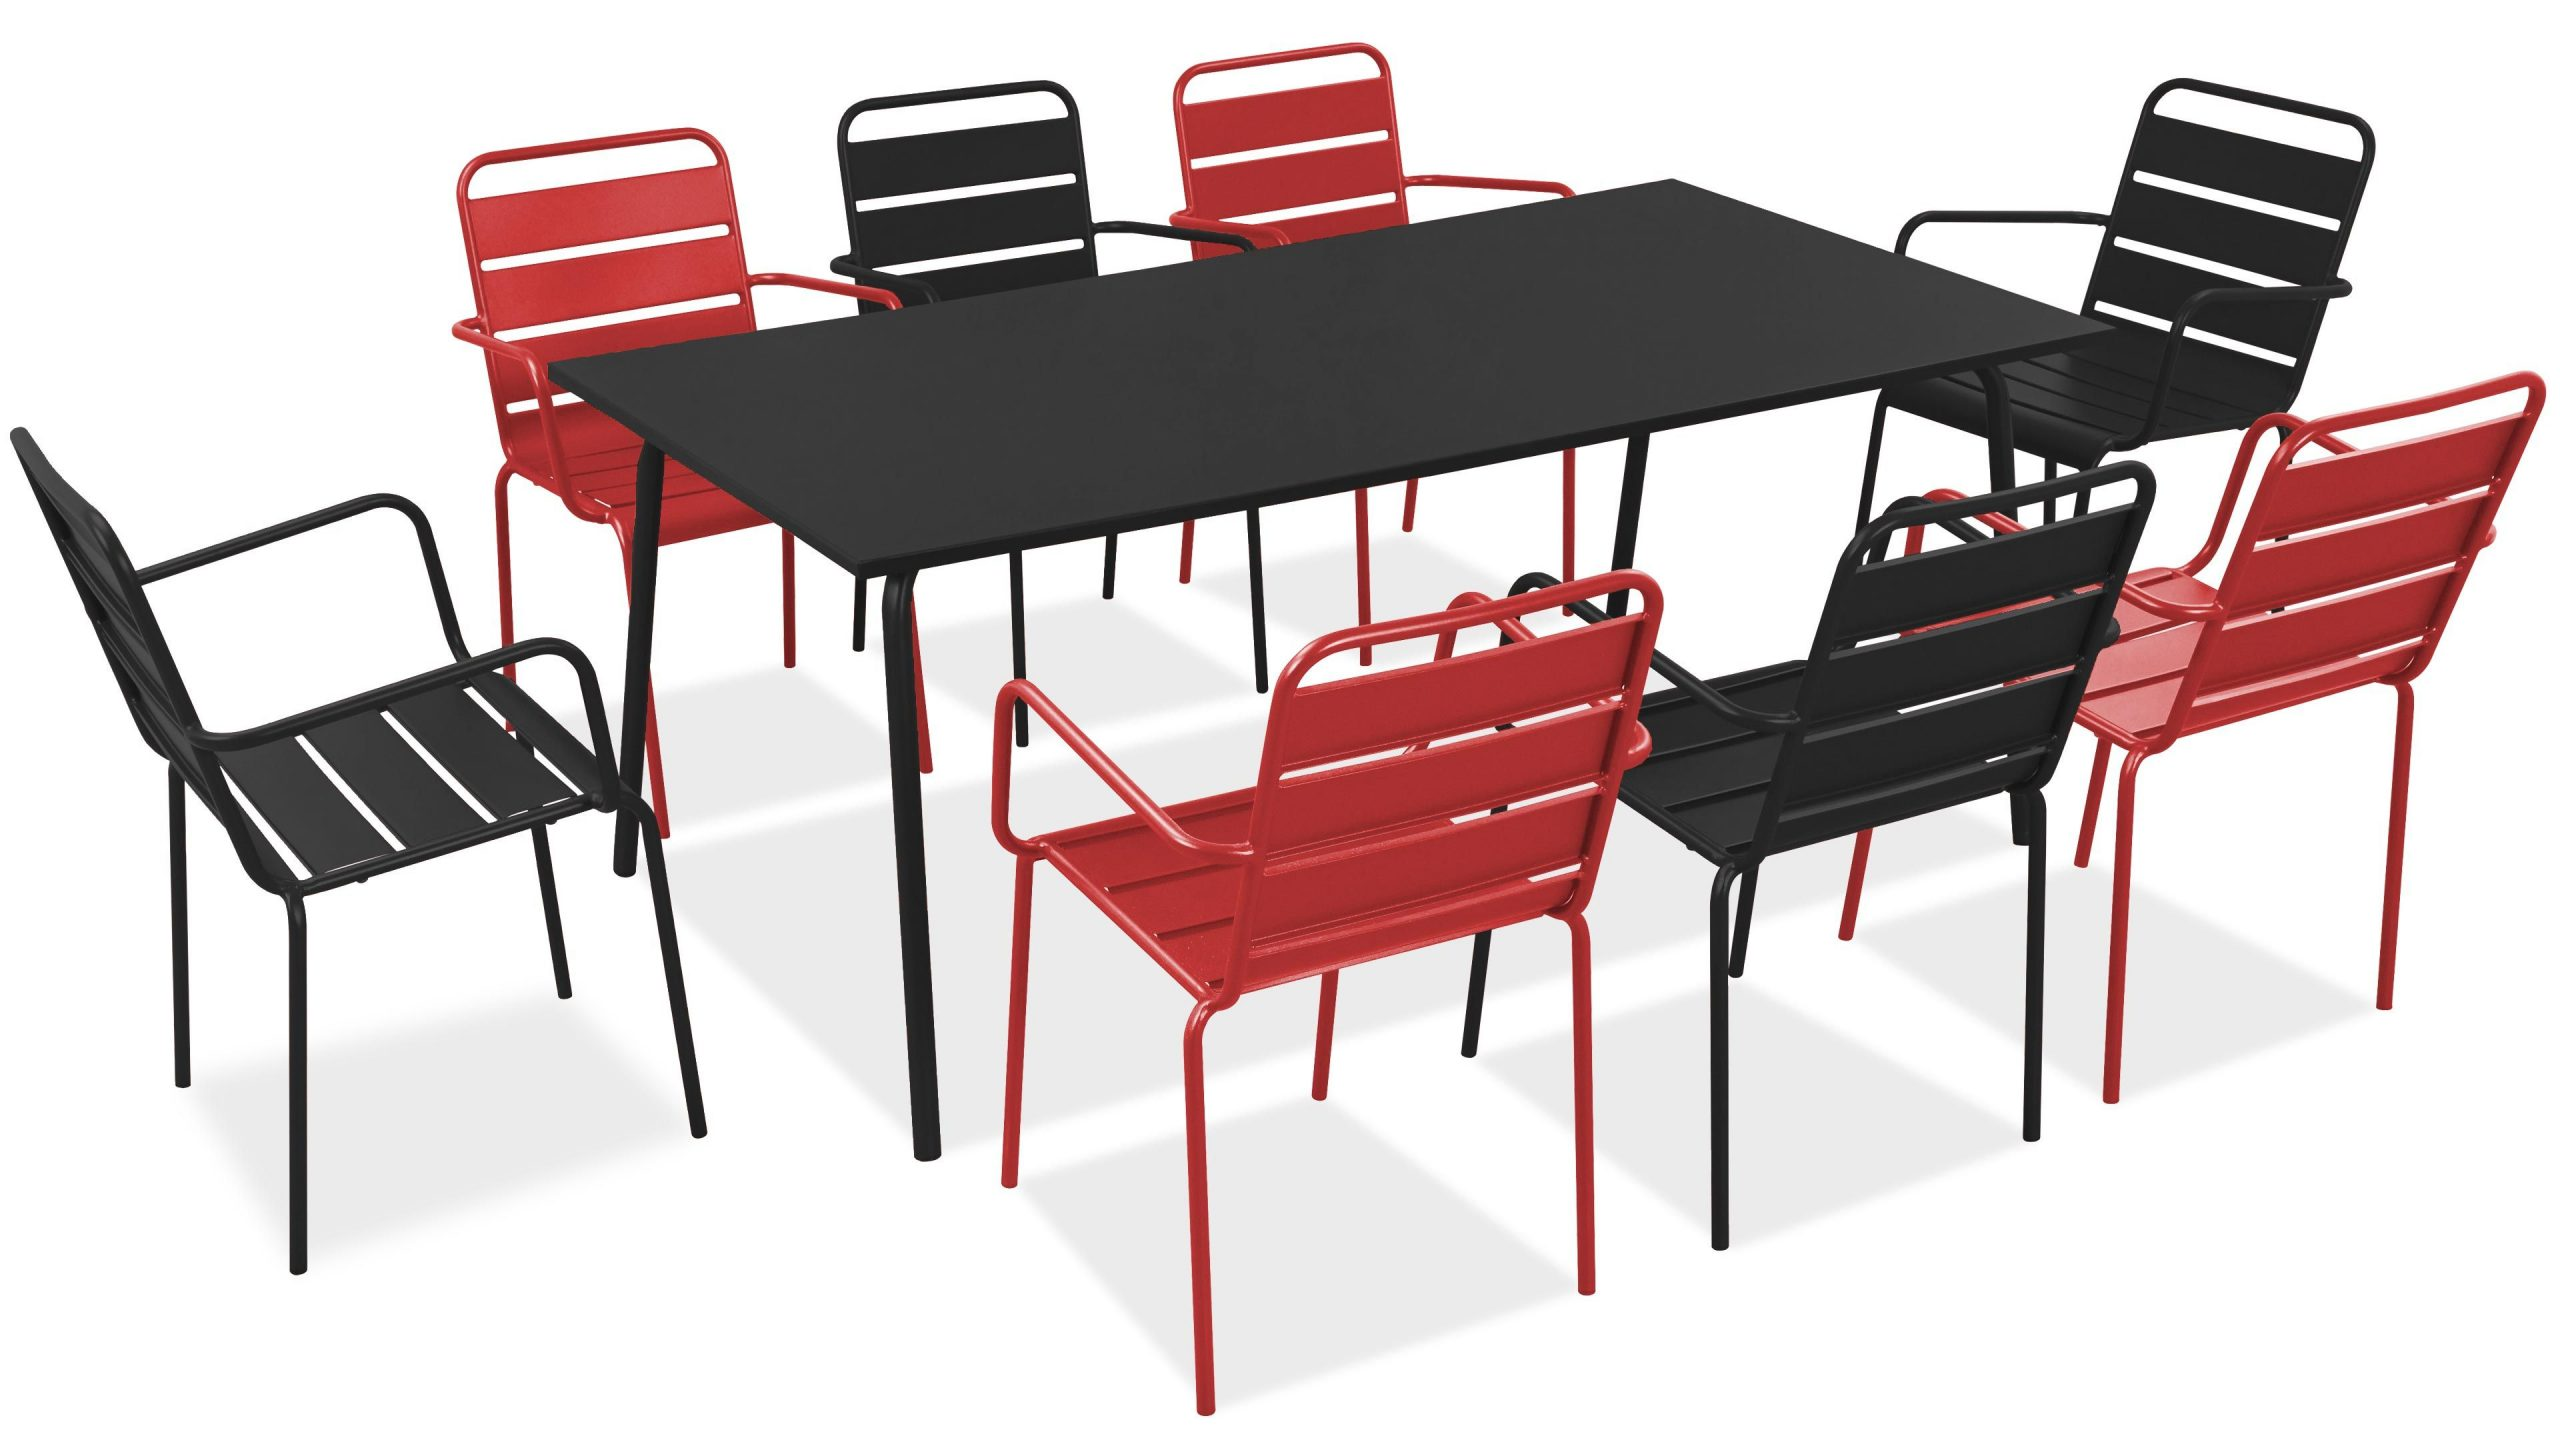 Salon De Jardin Metal Table Et Fauteuils serapportantà Table De Jardin Design Pas Cher